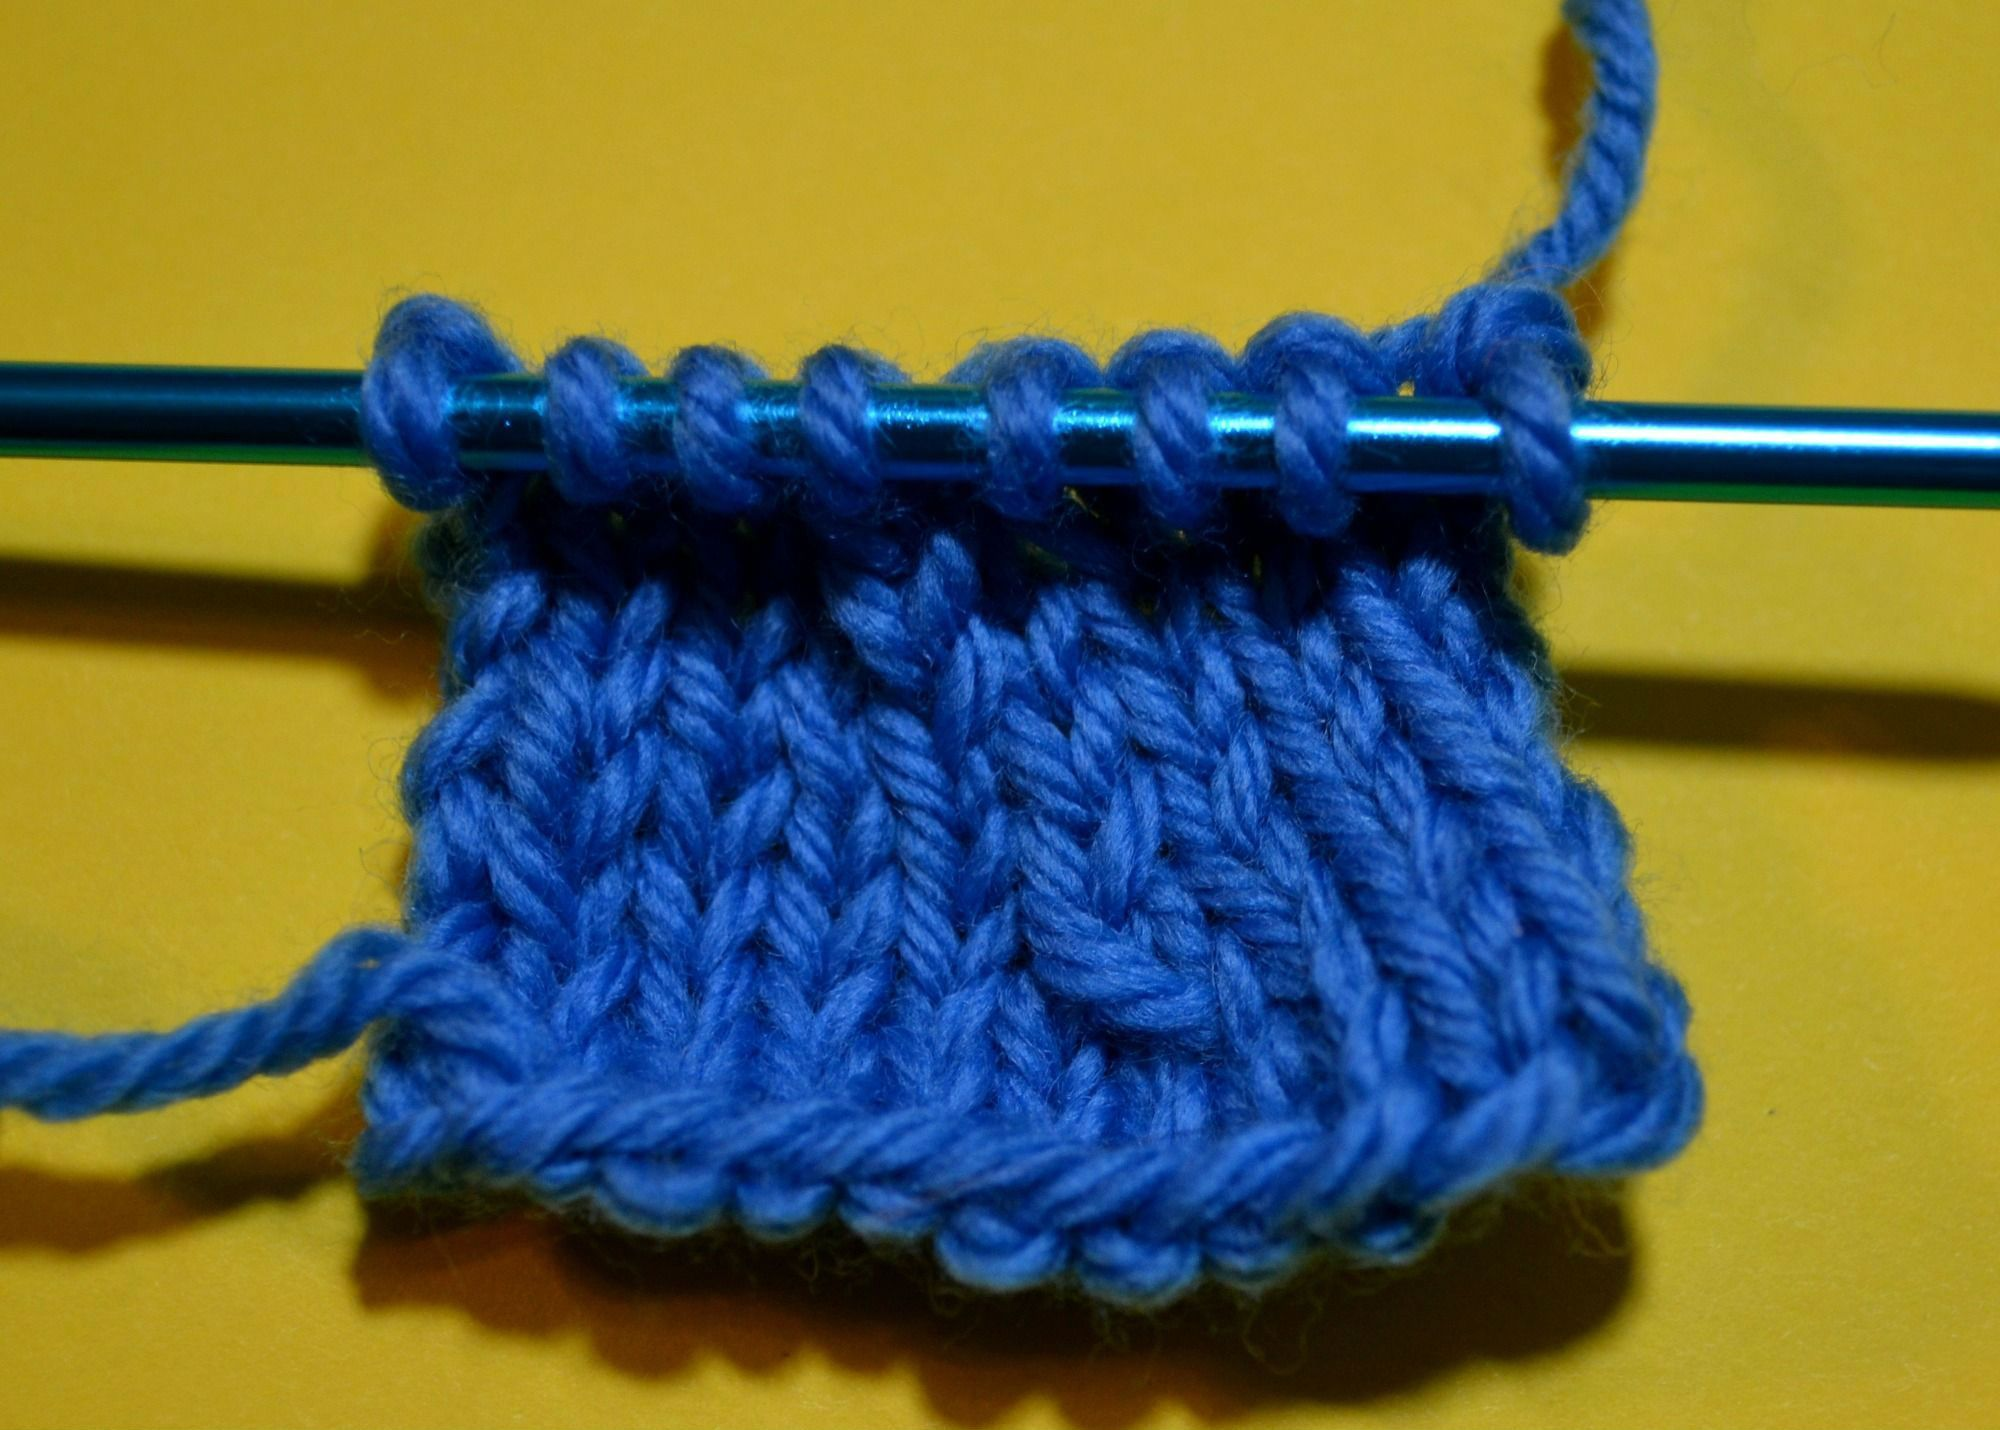 Knitting Yfwd Psso : Pass slipped stitch over psso